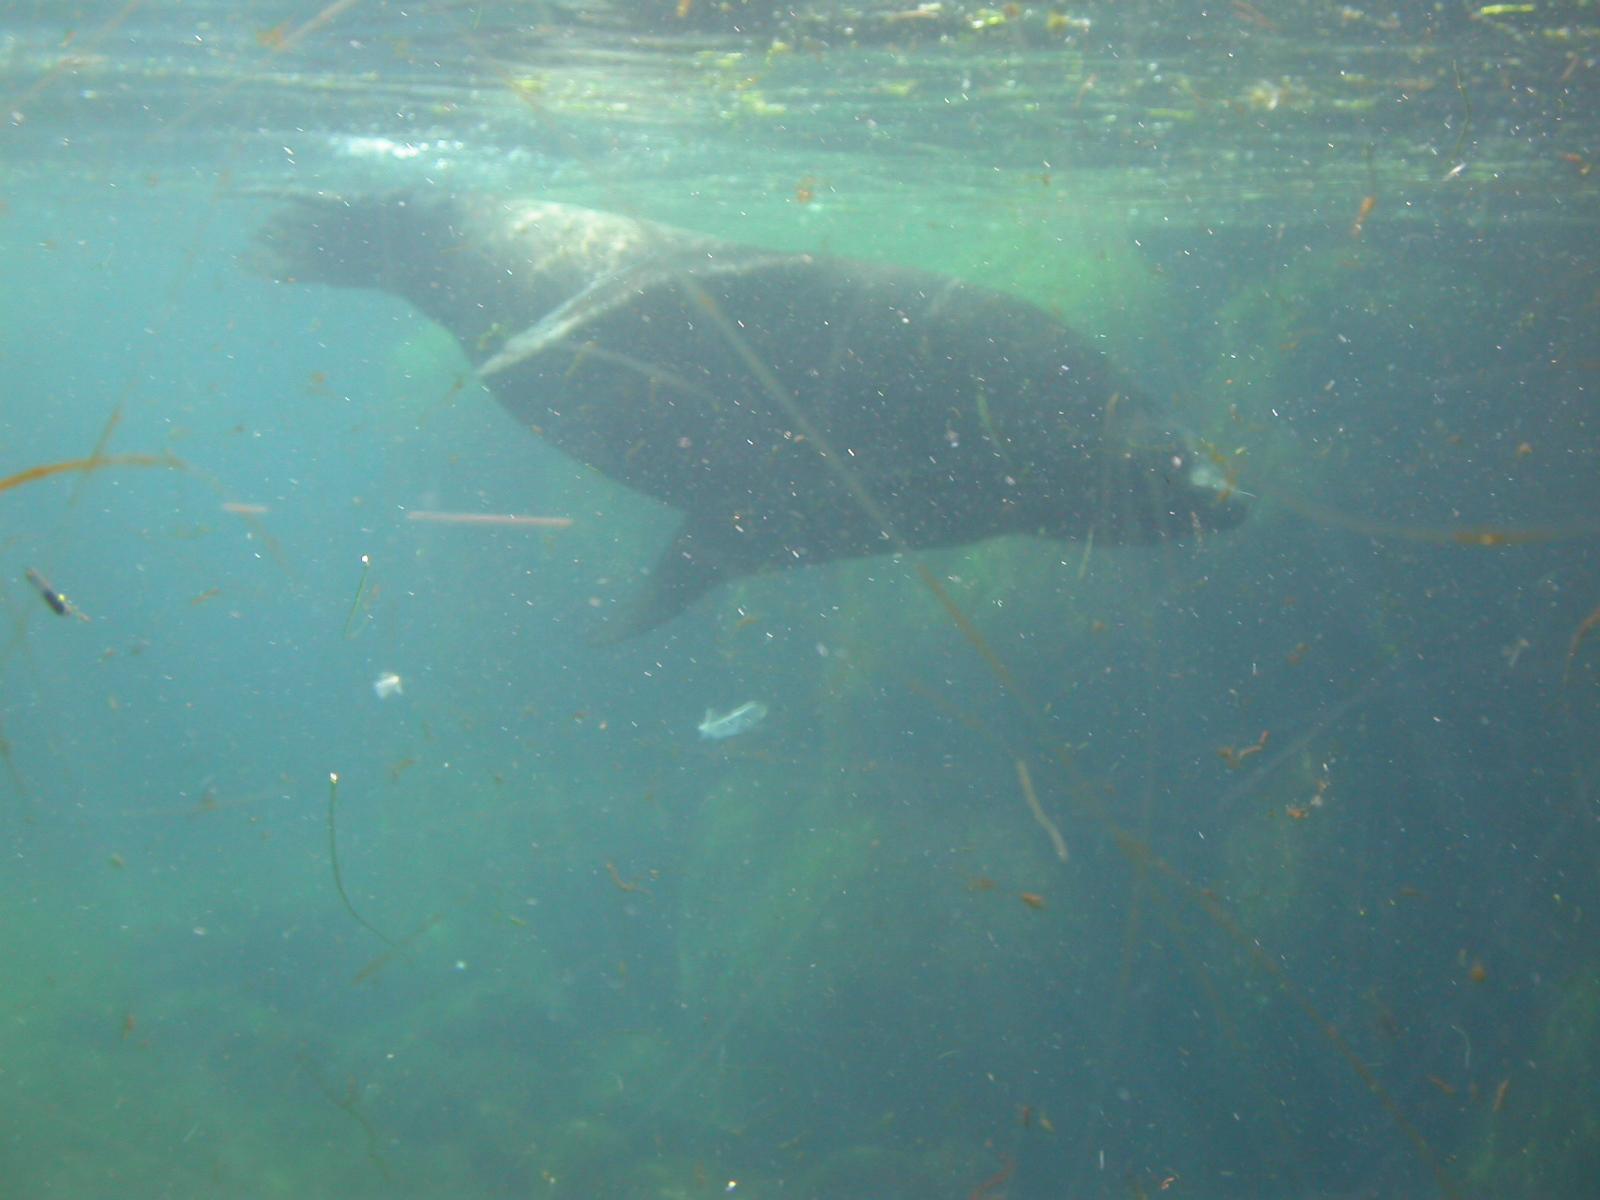 eva manatee large animal swimming water heavy green seal